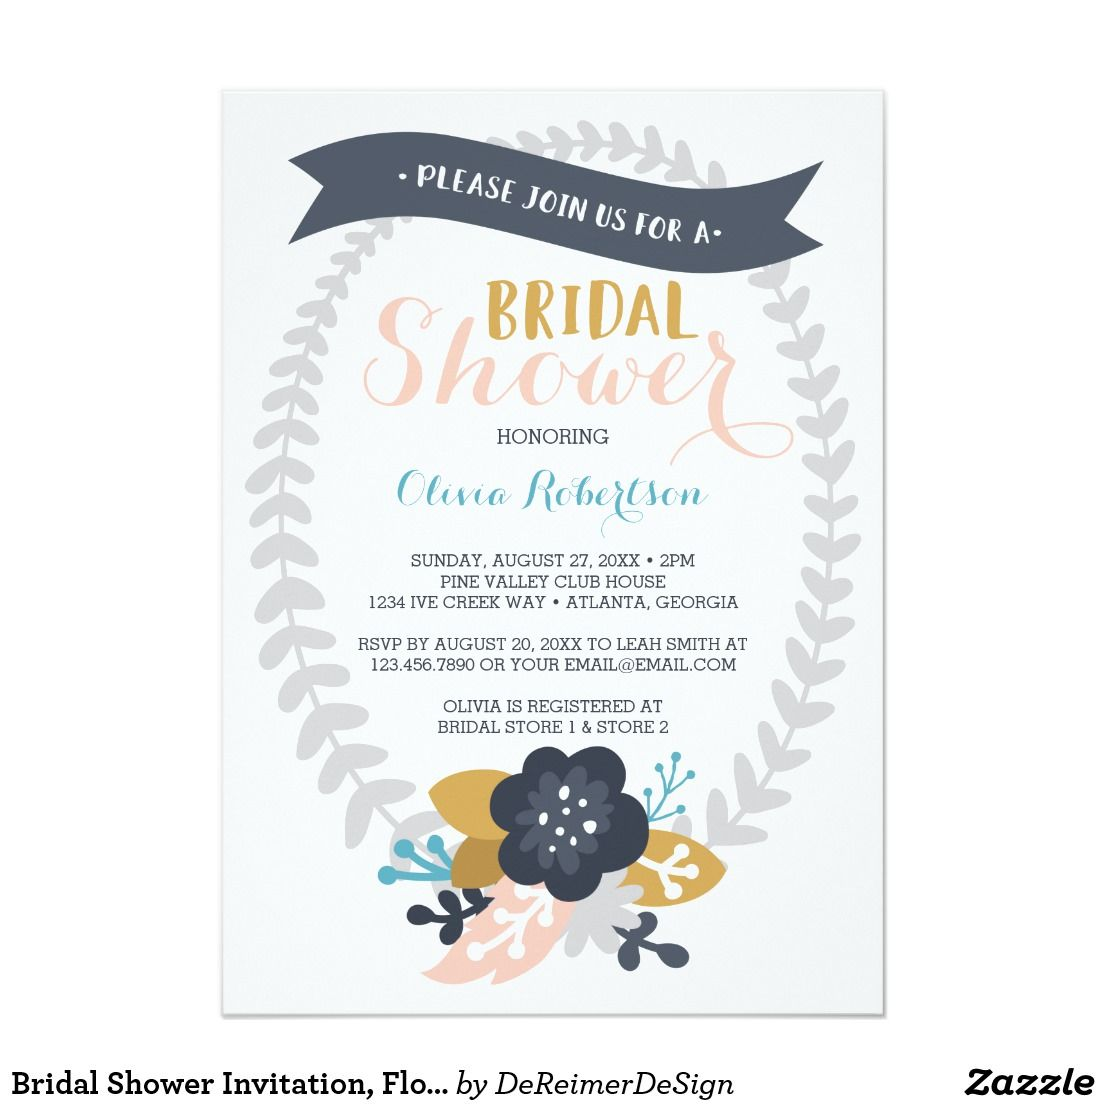 289fe96e9d43 Bridal Shower Invitation